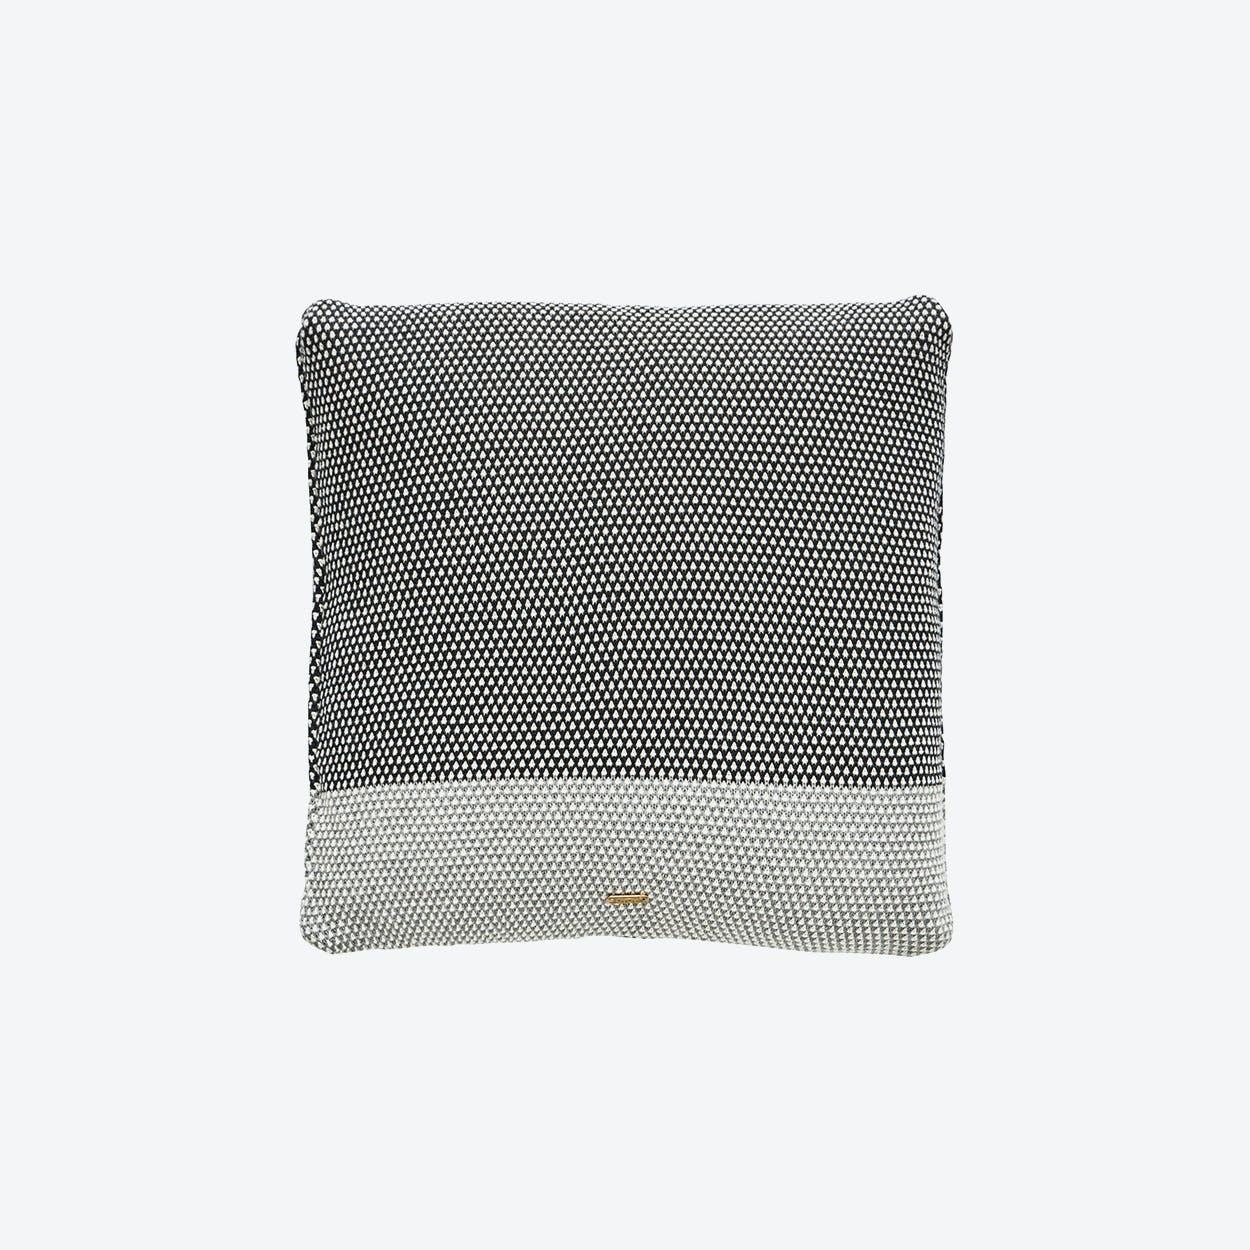 Koke Cushion in Grey / Anthracite